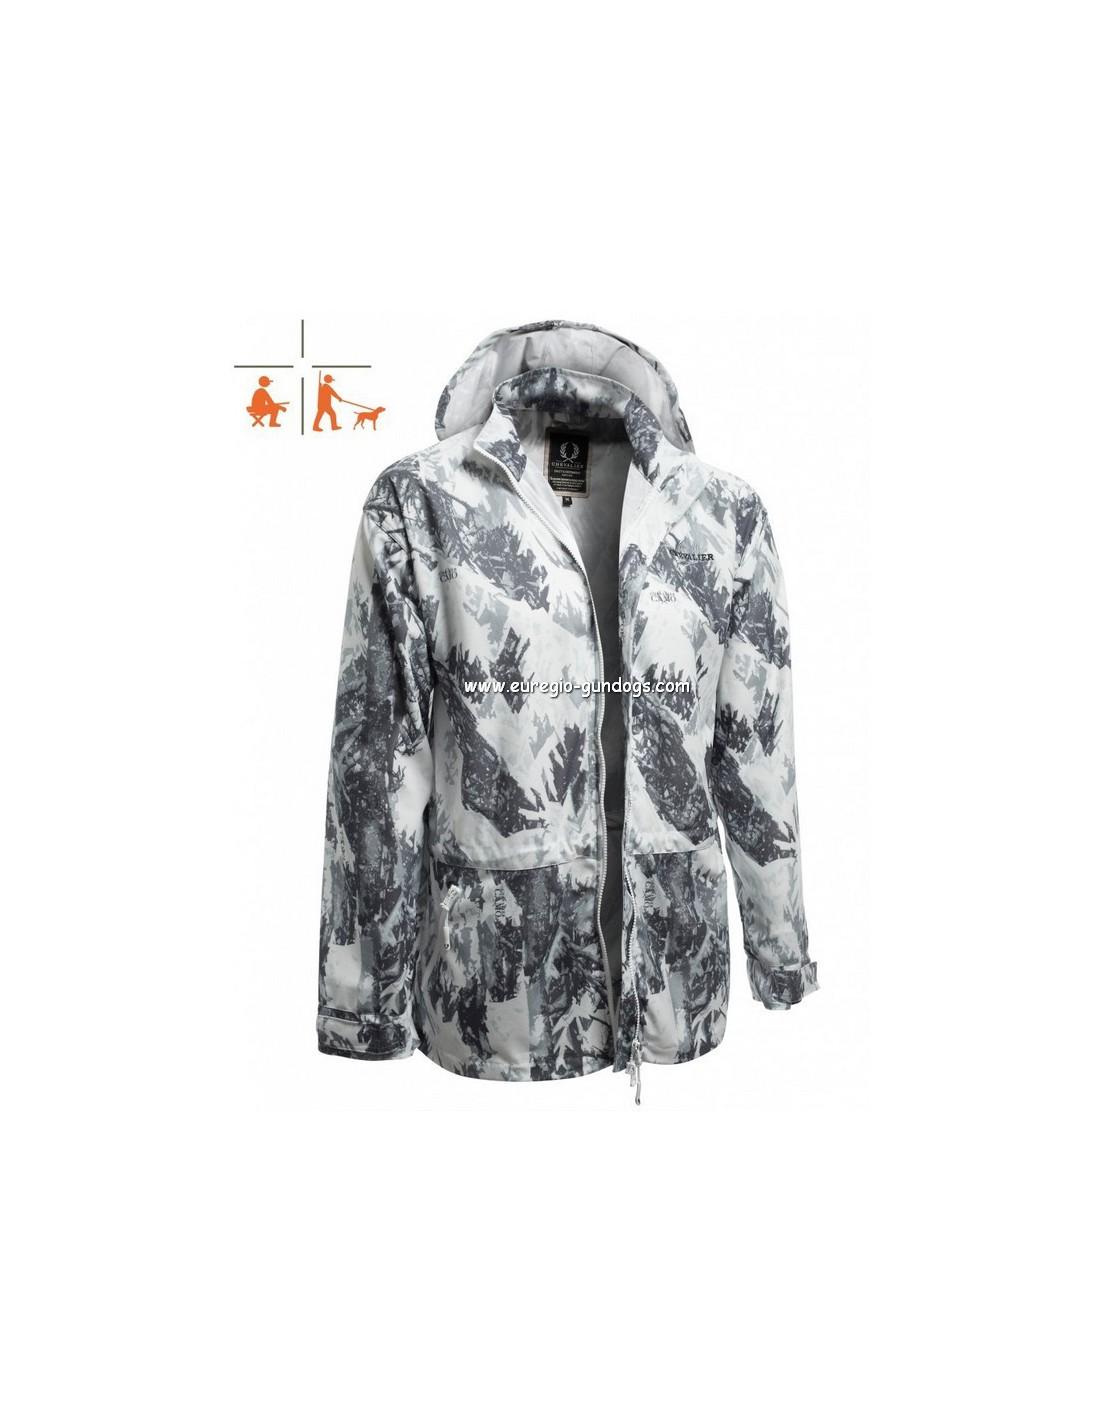 8af50a70 Chevalier Snow Camo Cover Coat and Pant Euregio Gundog Store